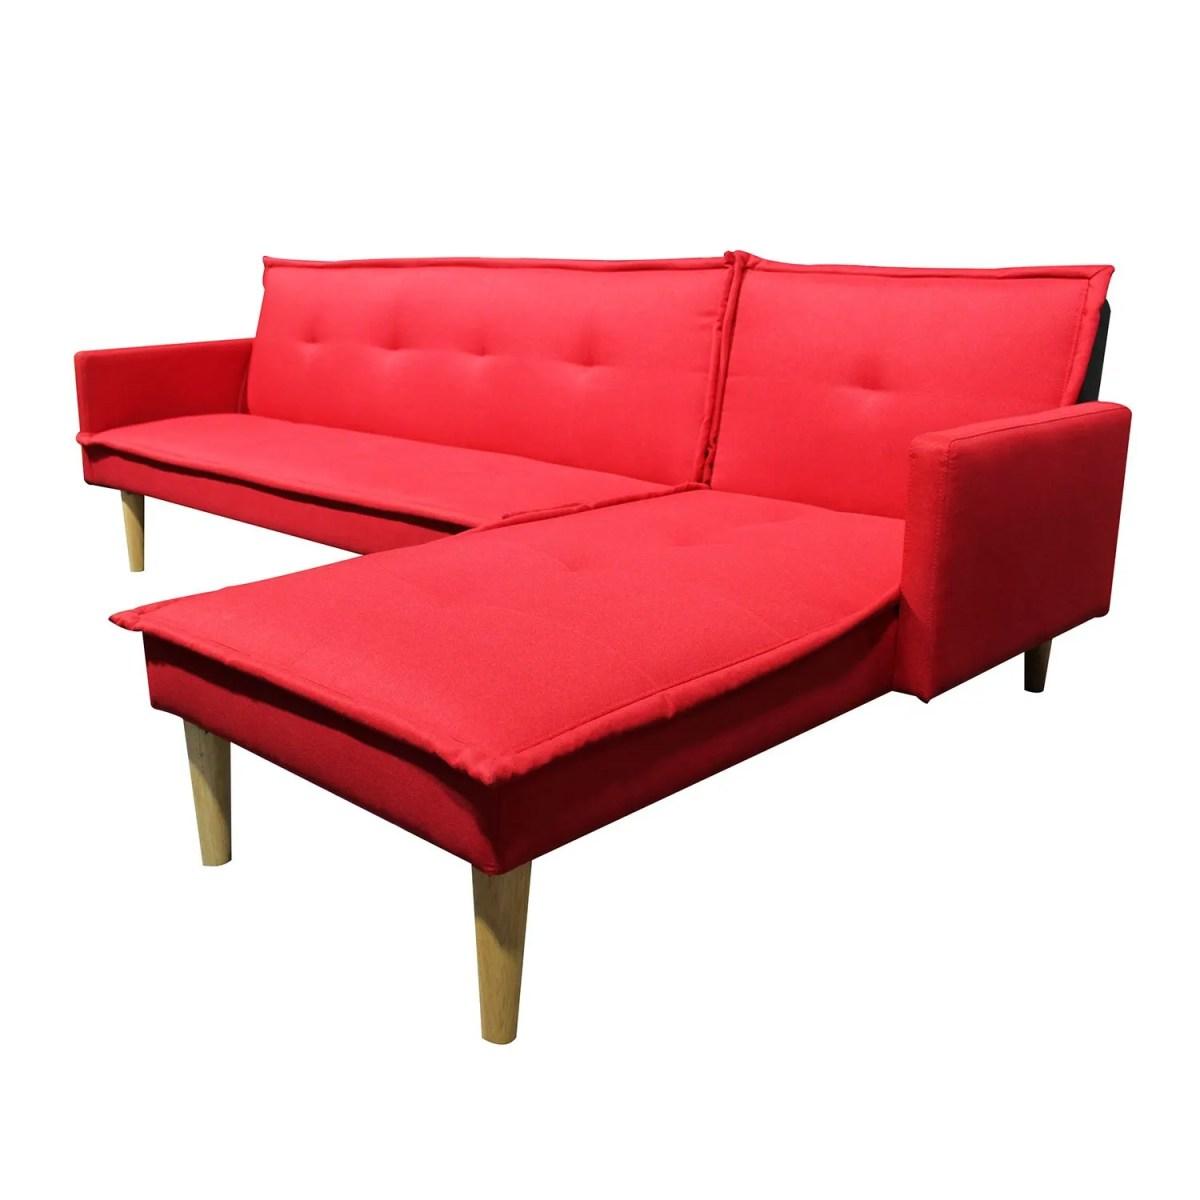 sala esquinada sofá cama independencia rojo 1